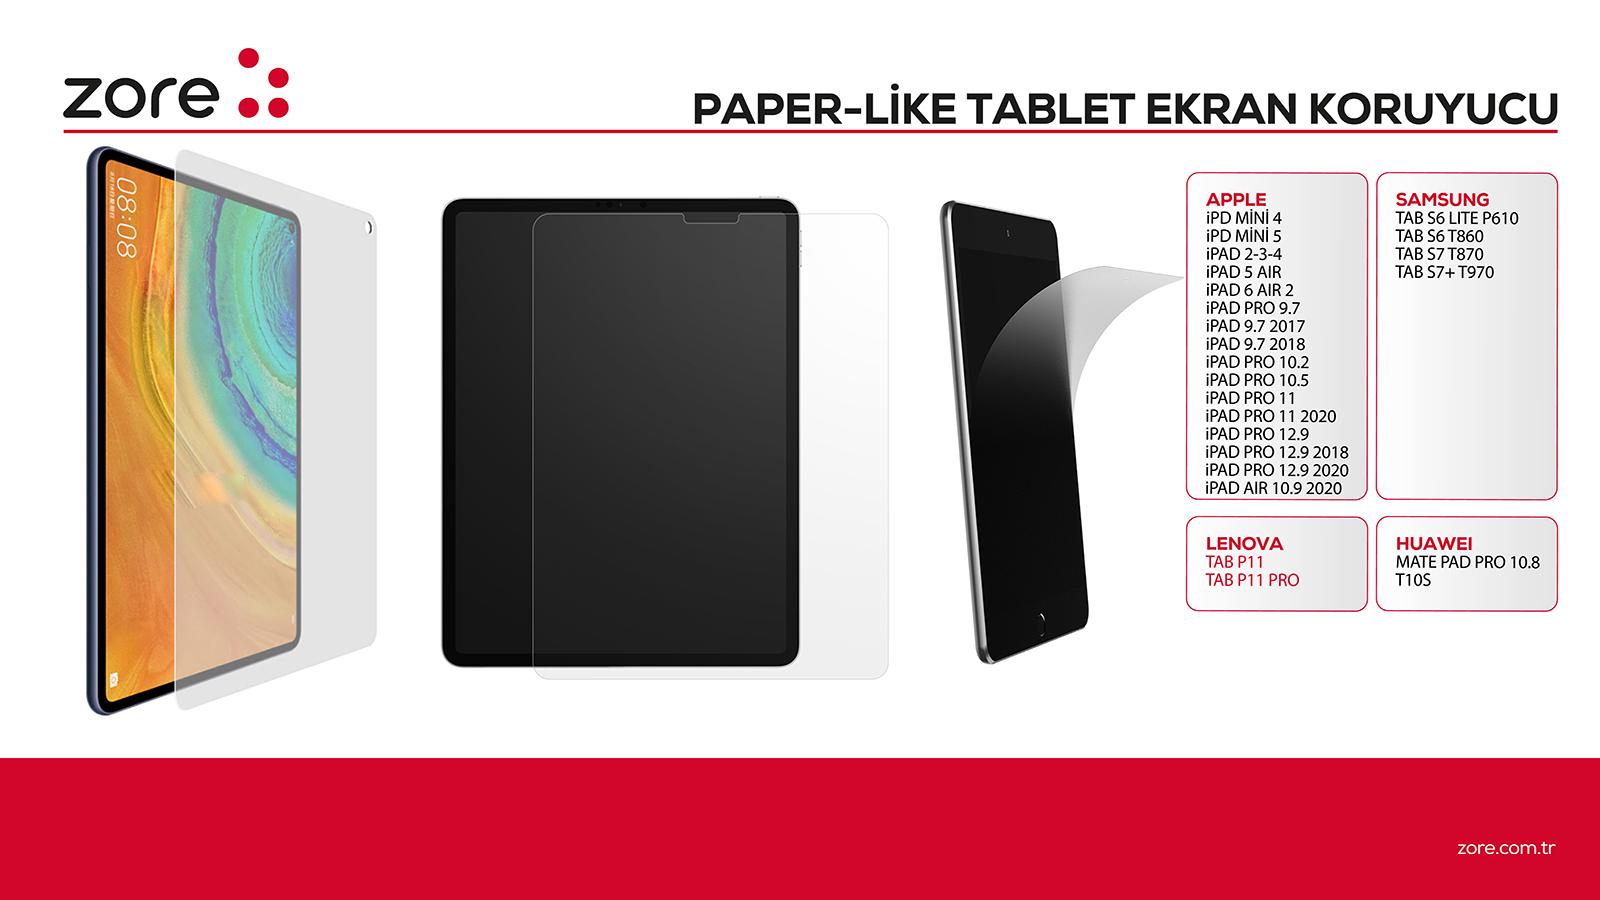 zore paper like.jpg (407 KB)